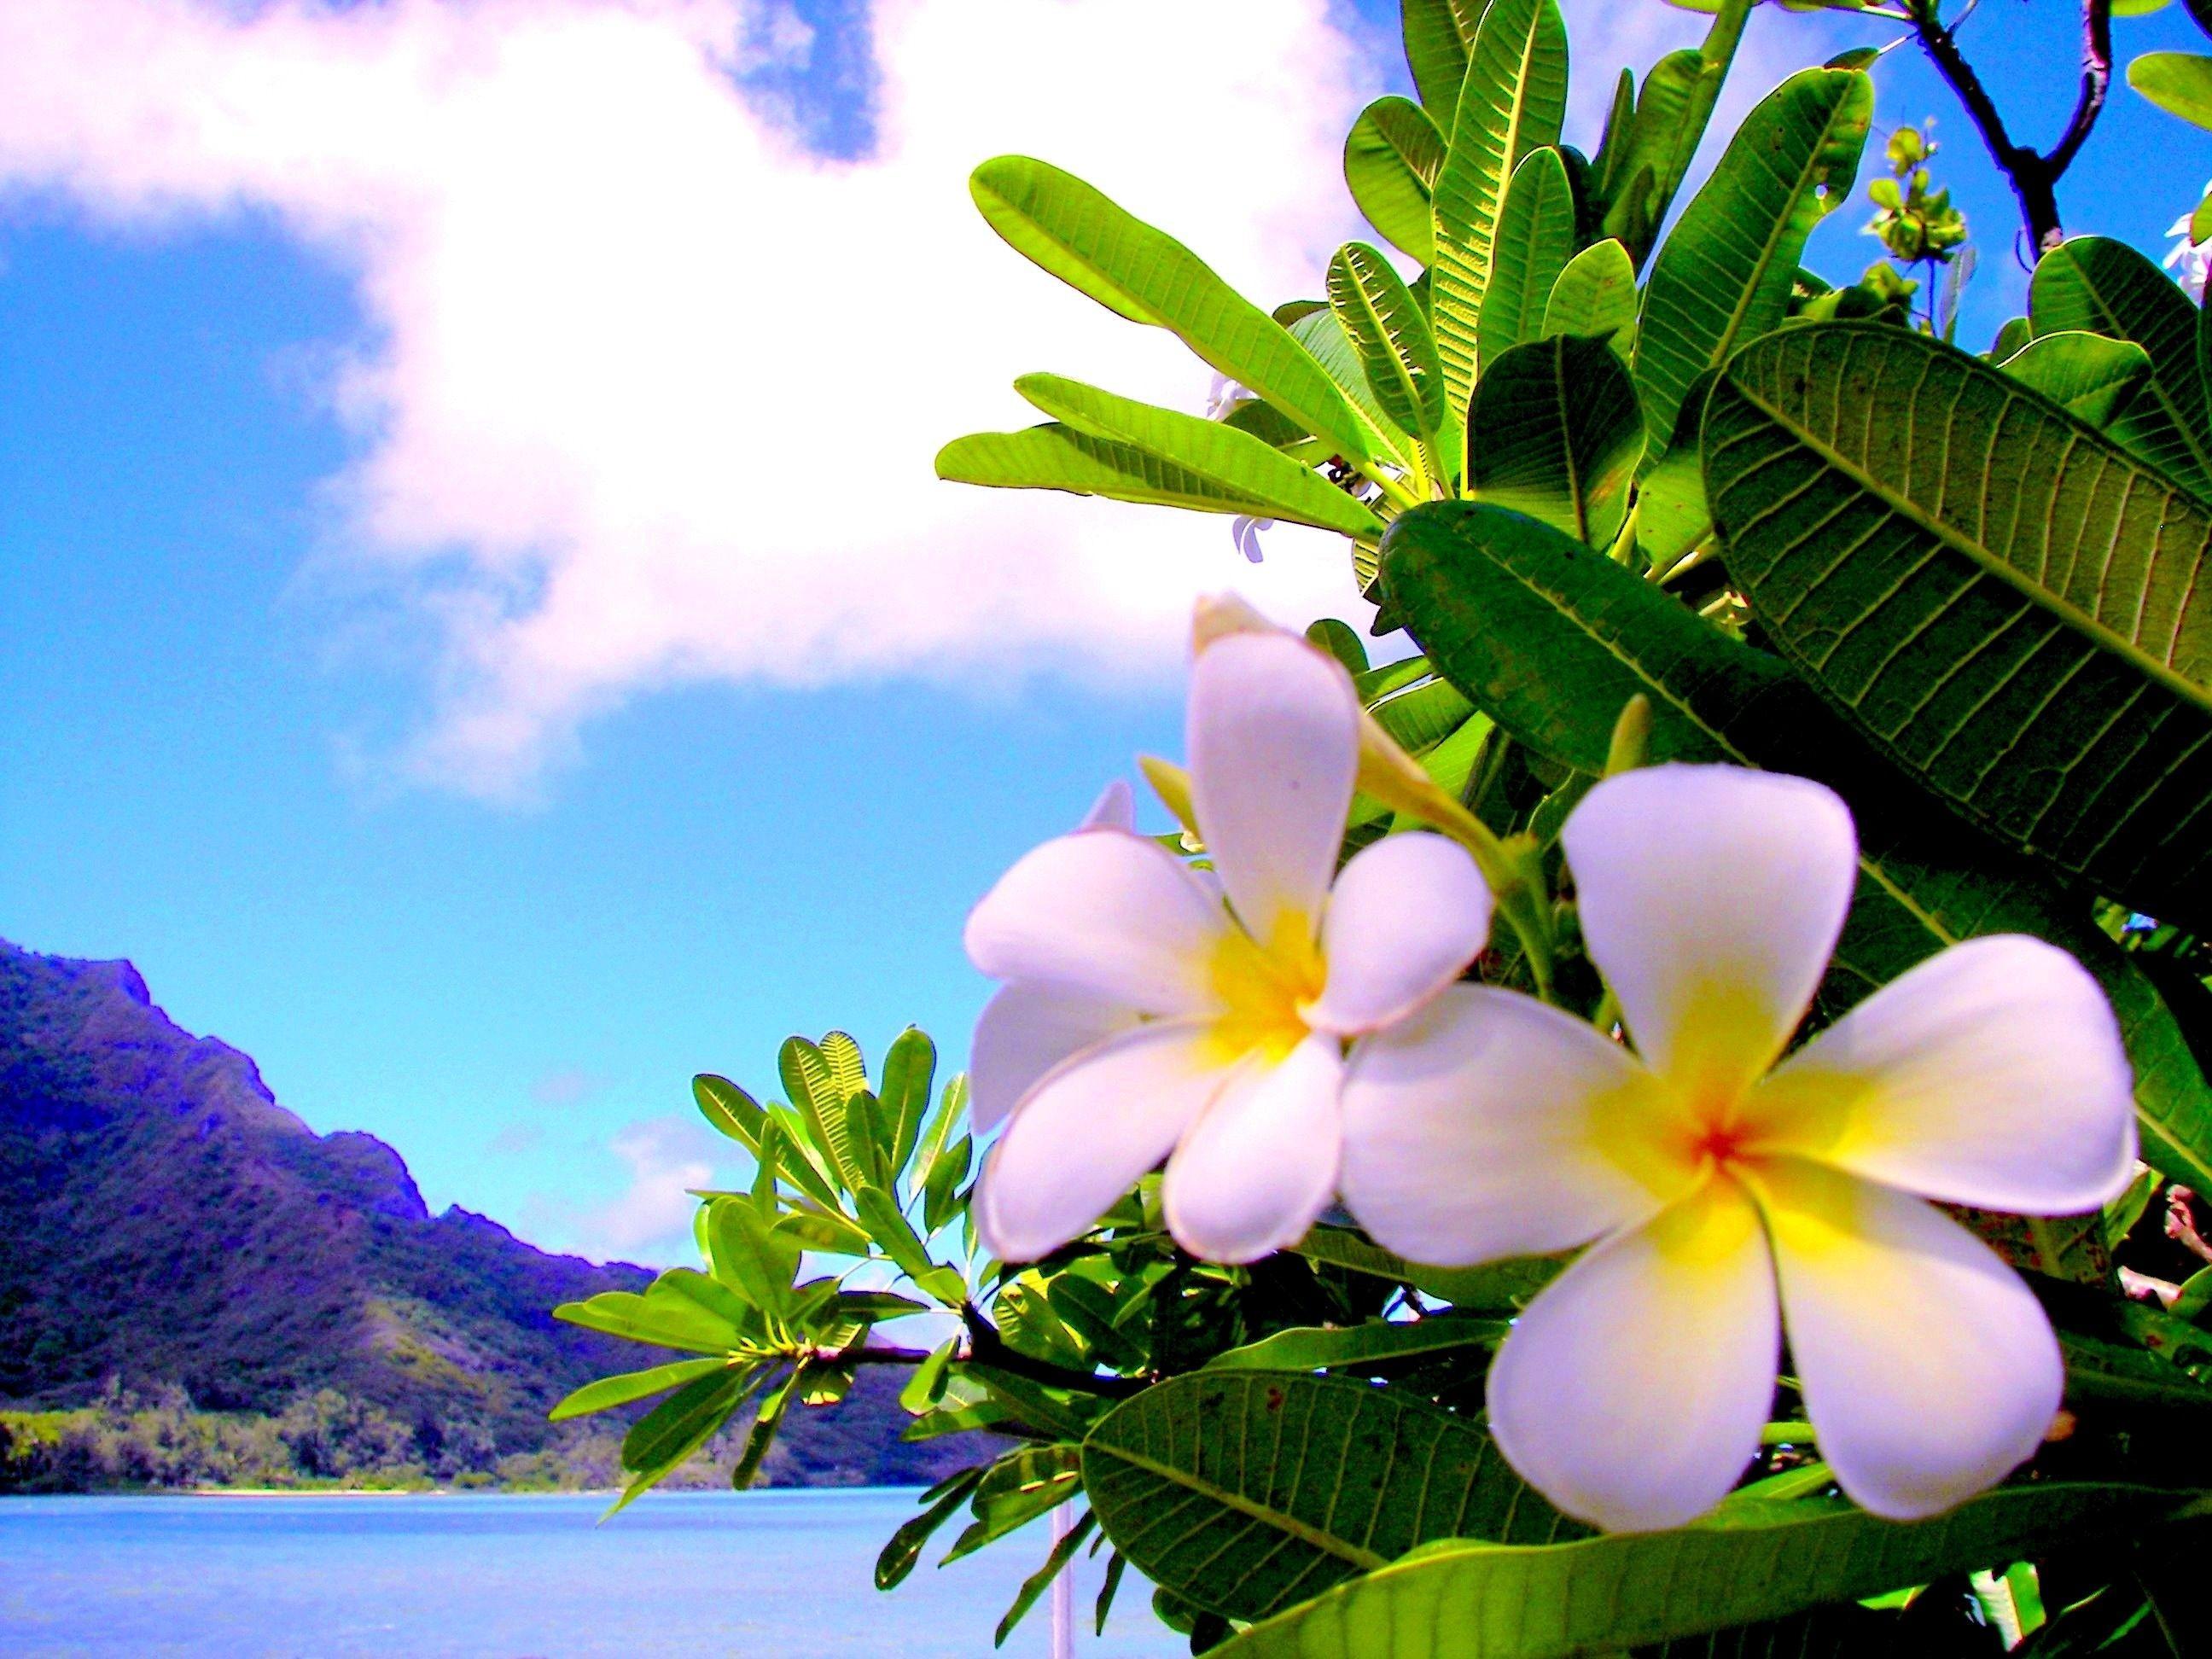 Hawaiian Flowers Wallpaper 47 Images